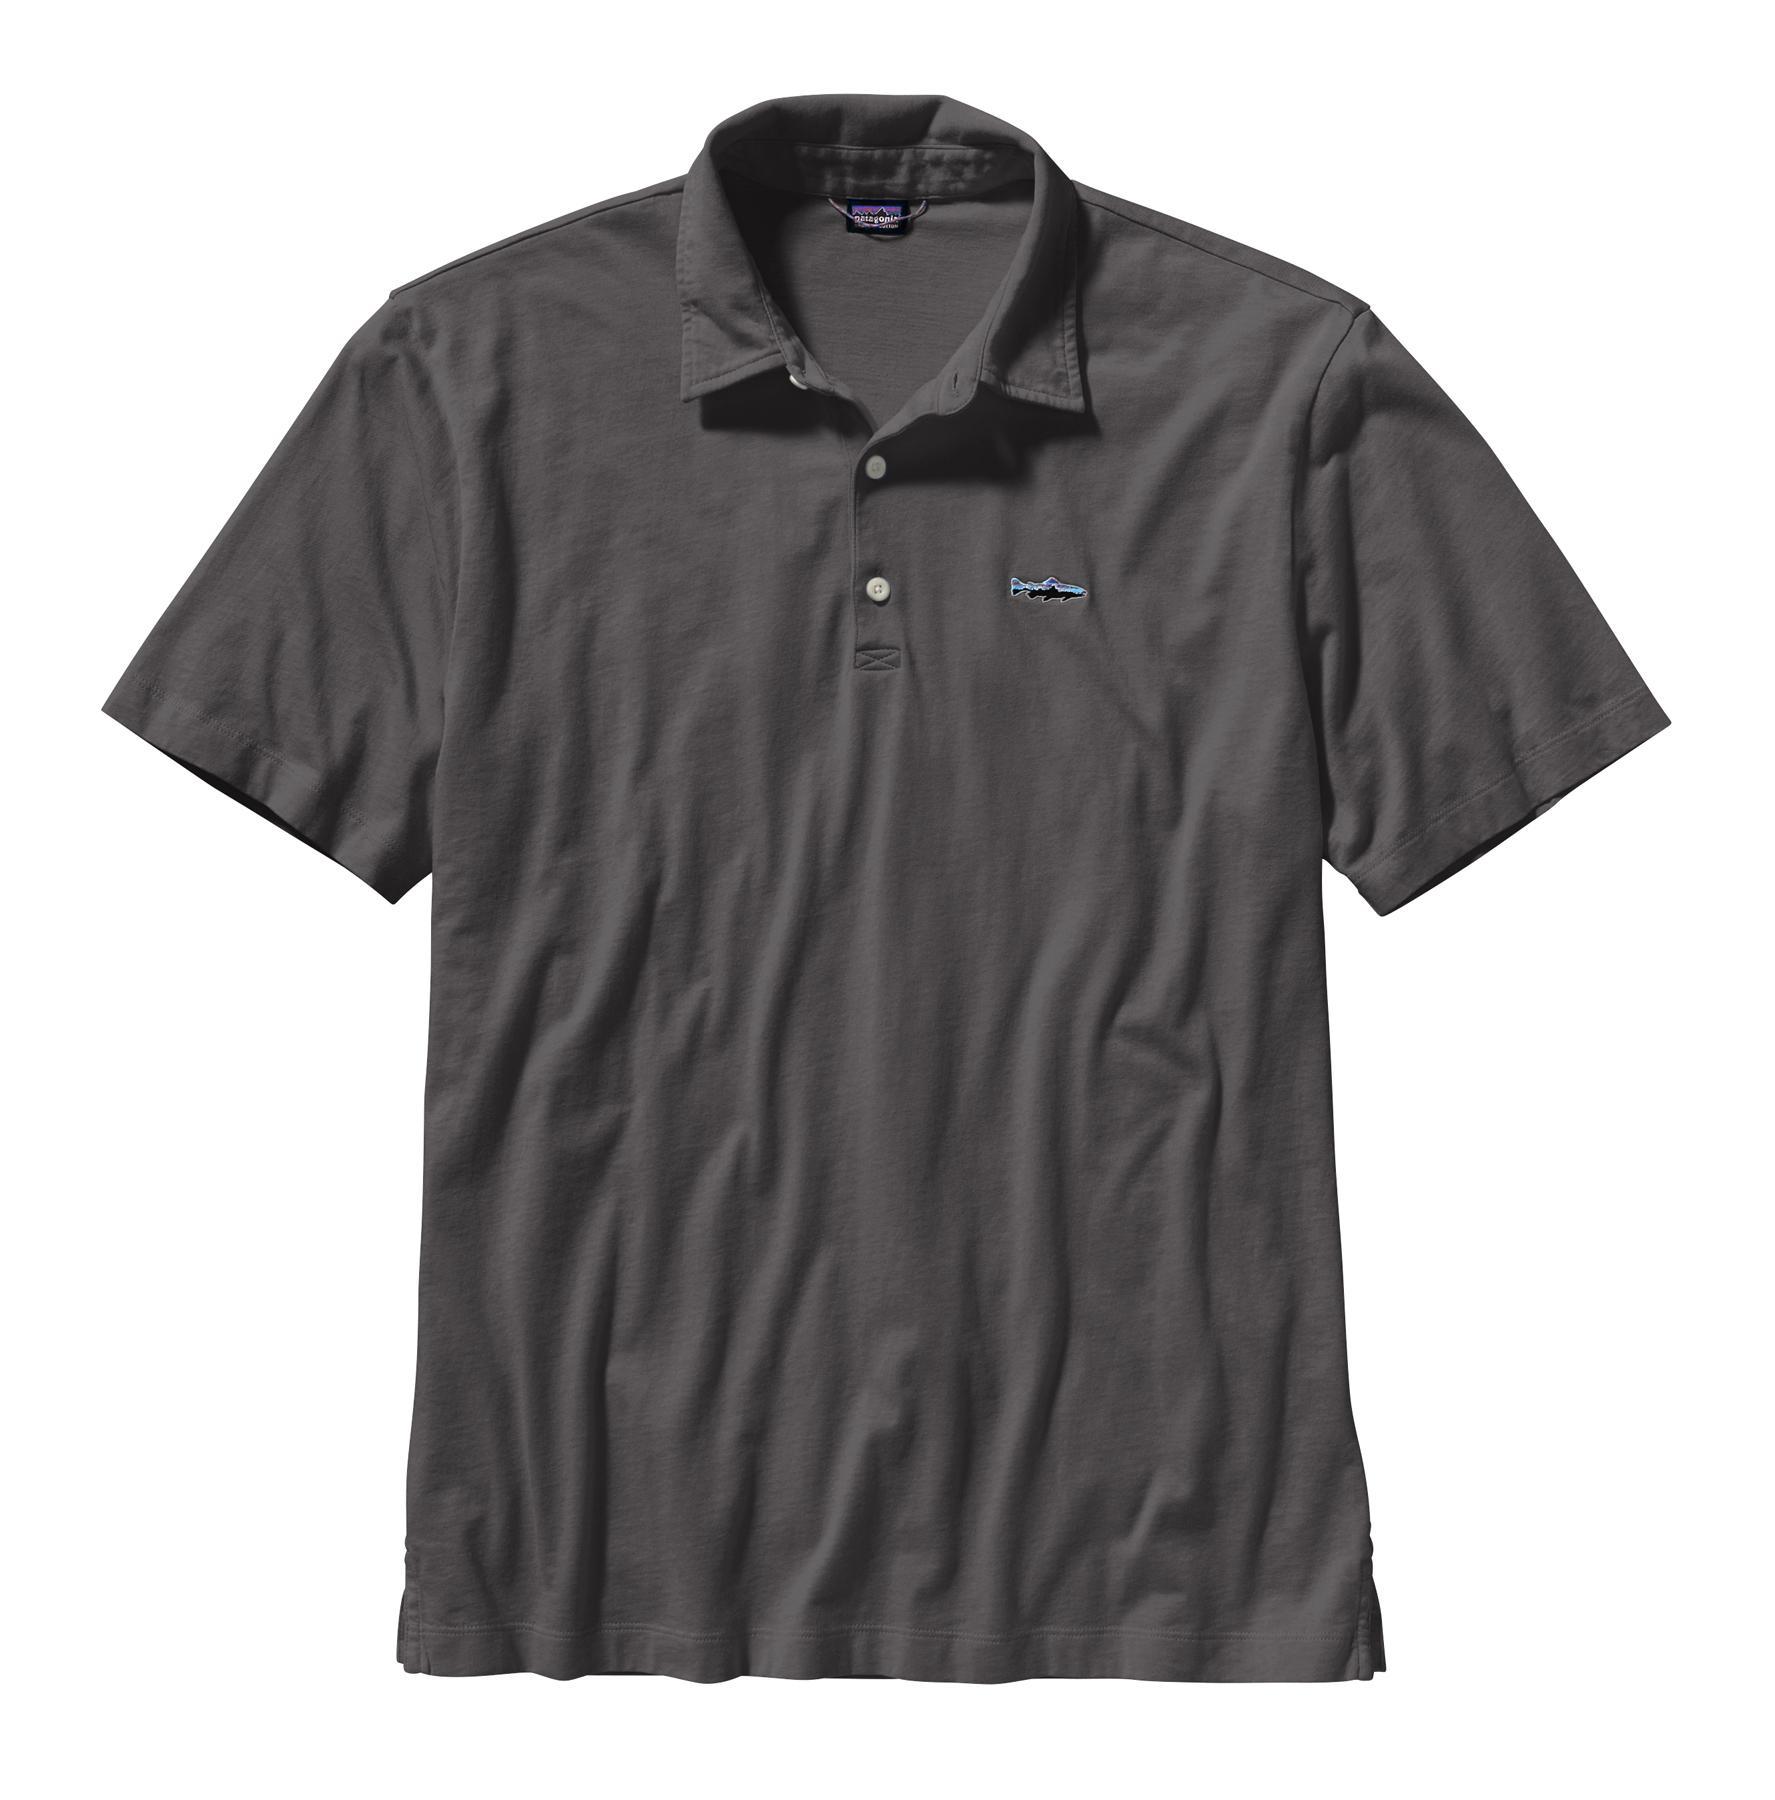 Patagonia Men's Polo Trout Fitz Roy Shirt FGE_FORGREY